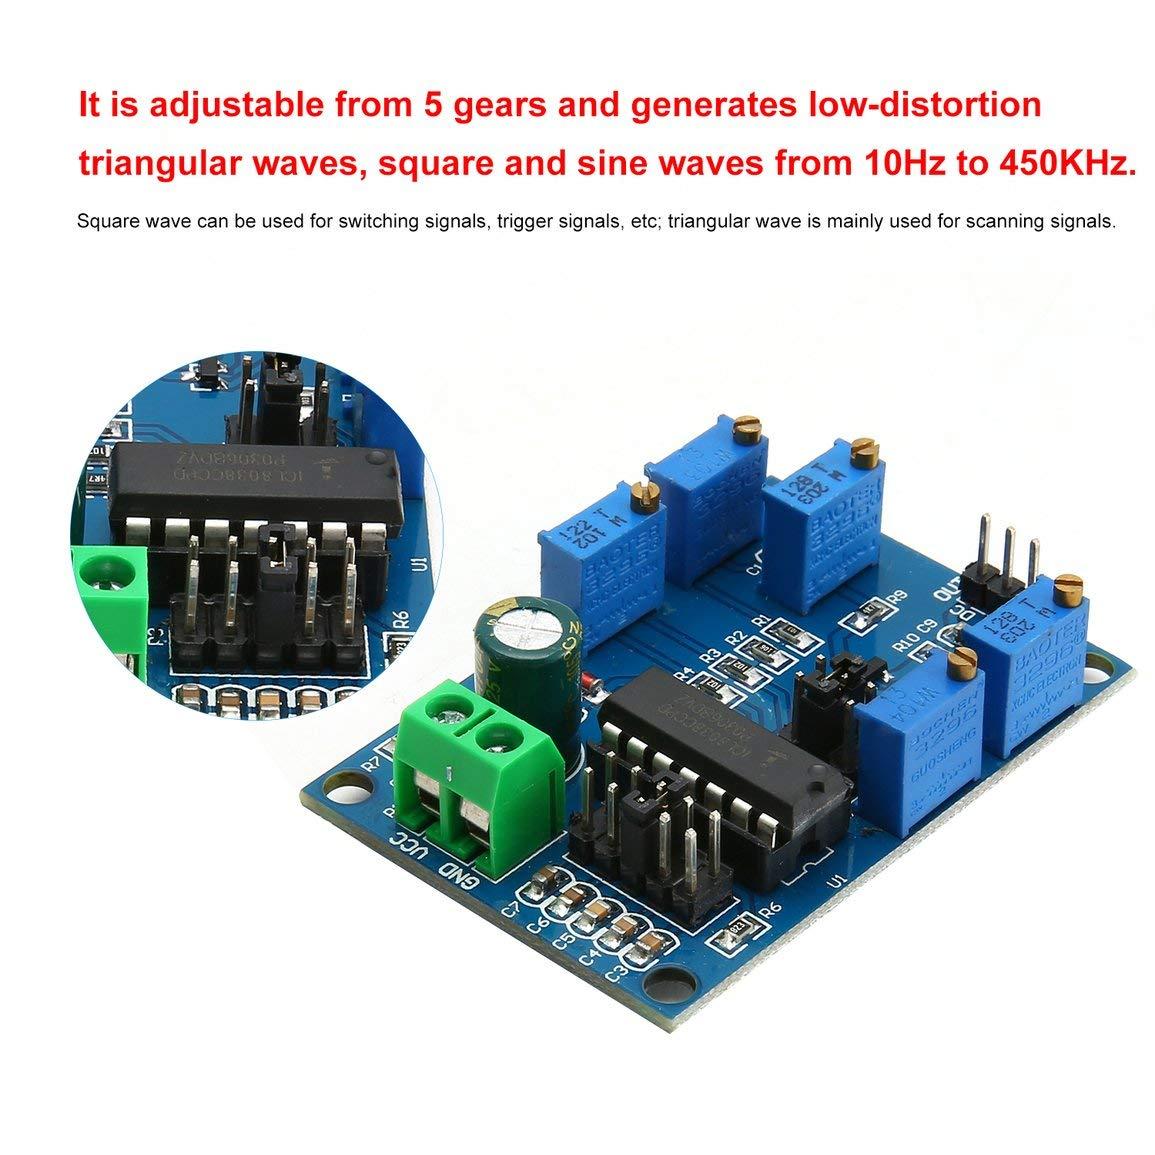 Farbe: blau ICL8038 Signalgenerator Triangular//Rechteck//Sinus-Generator-Modul Medium//Low Frequency 10Hz-450 kHz 12V bis 15V